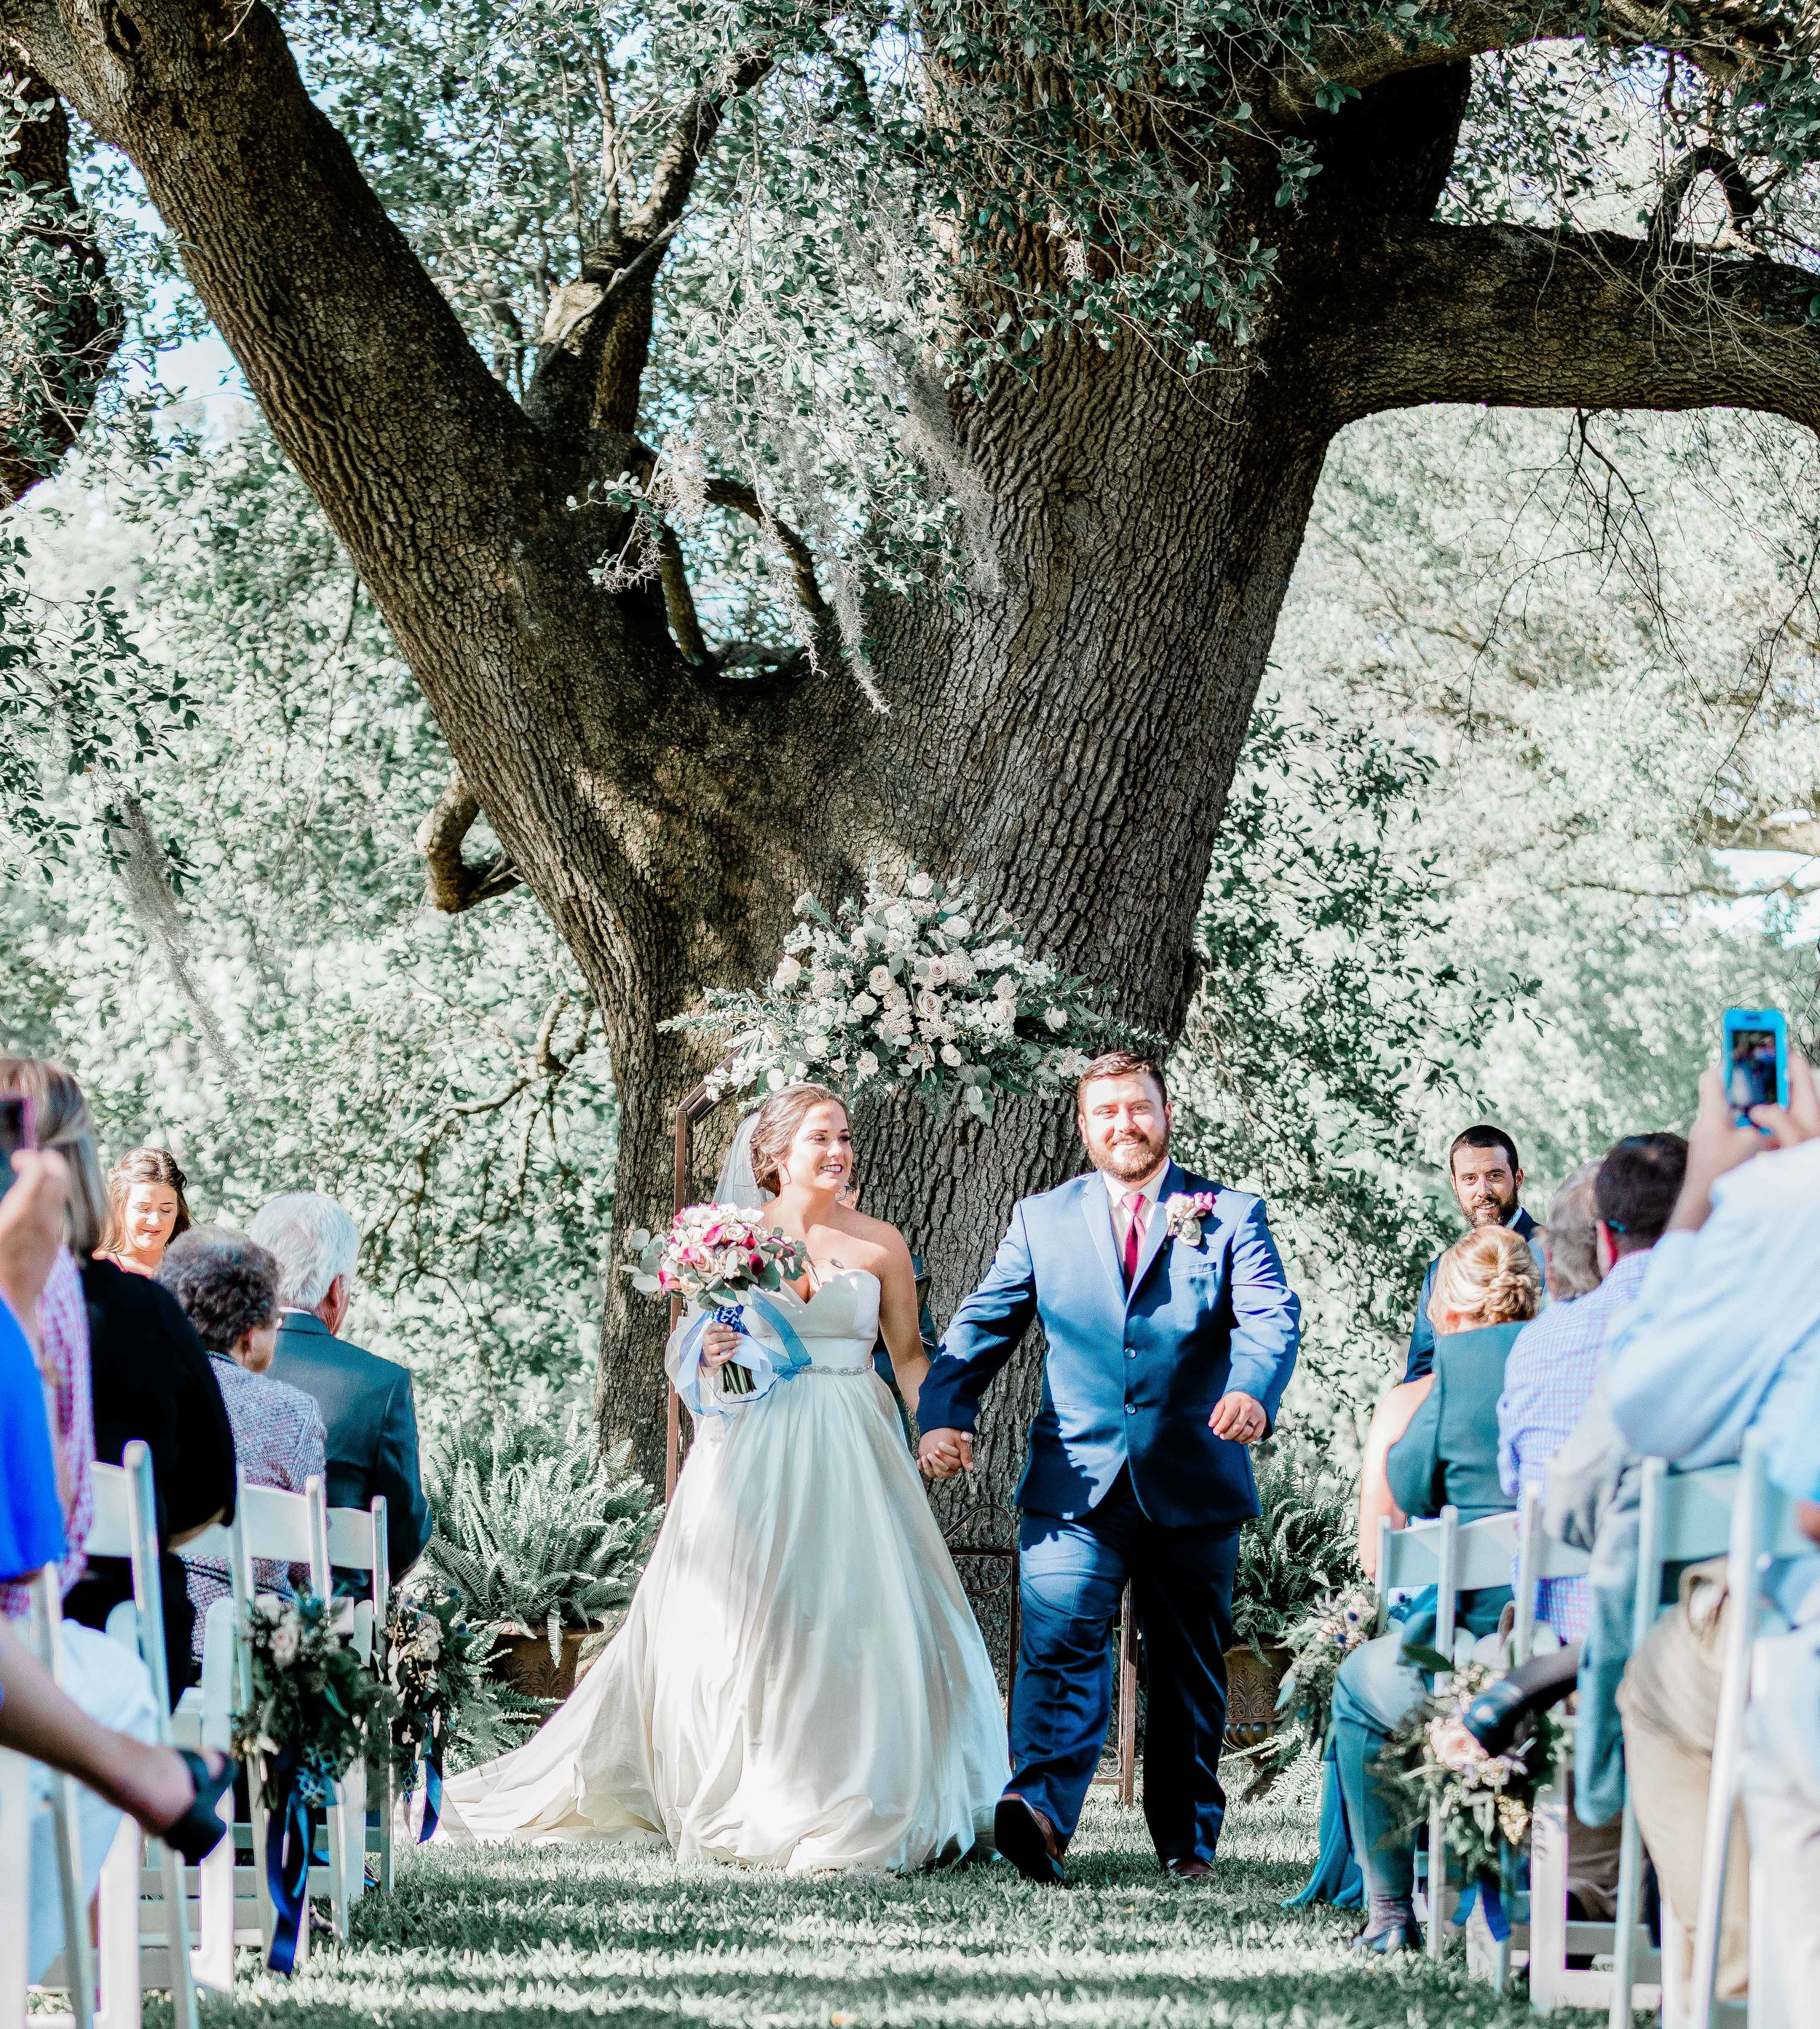 20190427-Southern Lens Photography- Savannah Wedding Photographer-Screven and Caroline-201969.jpg